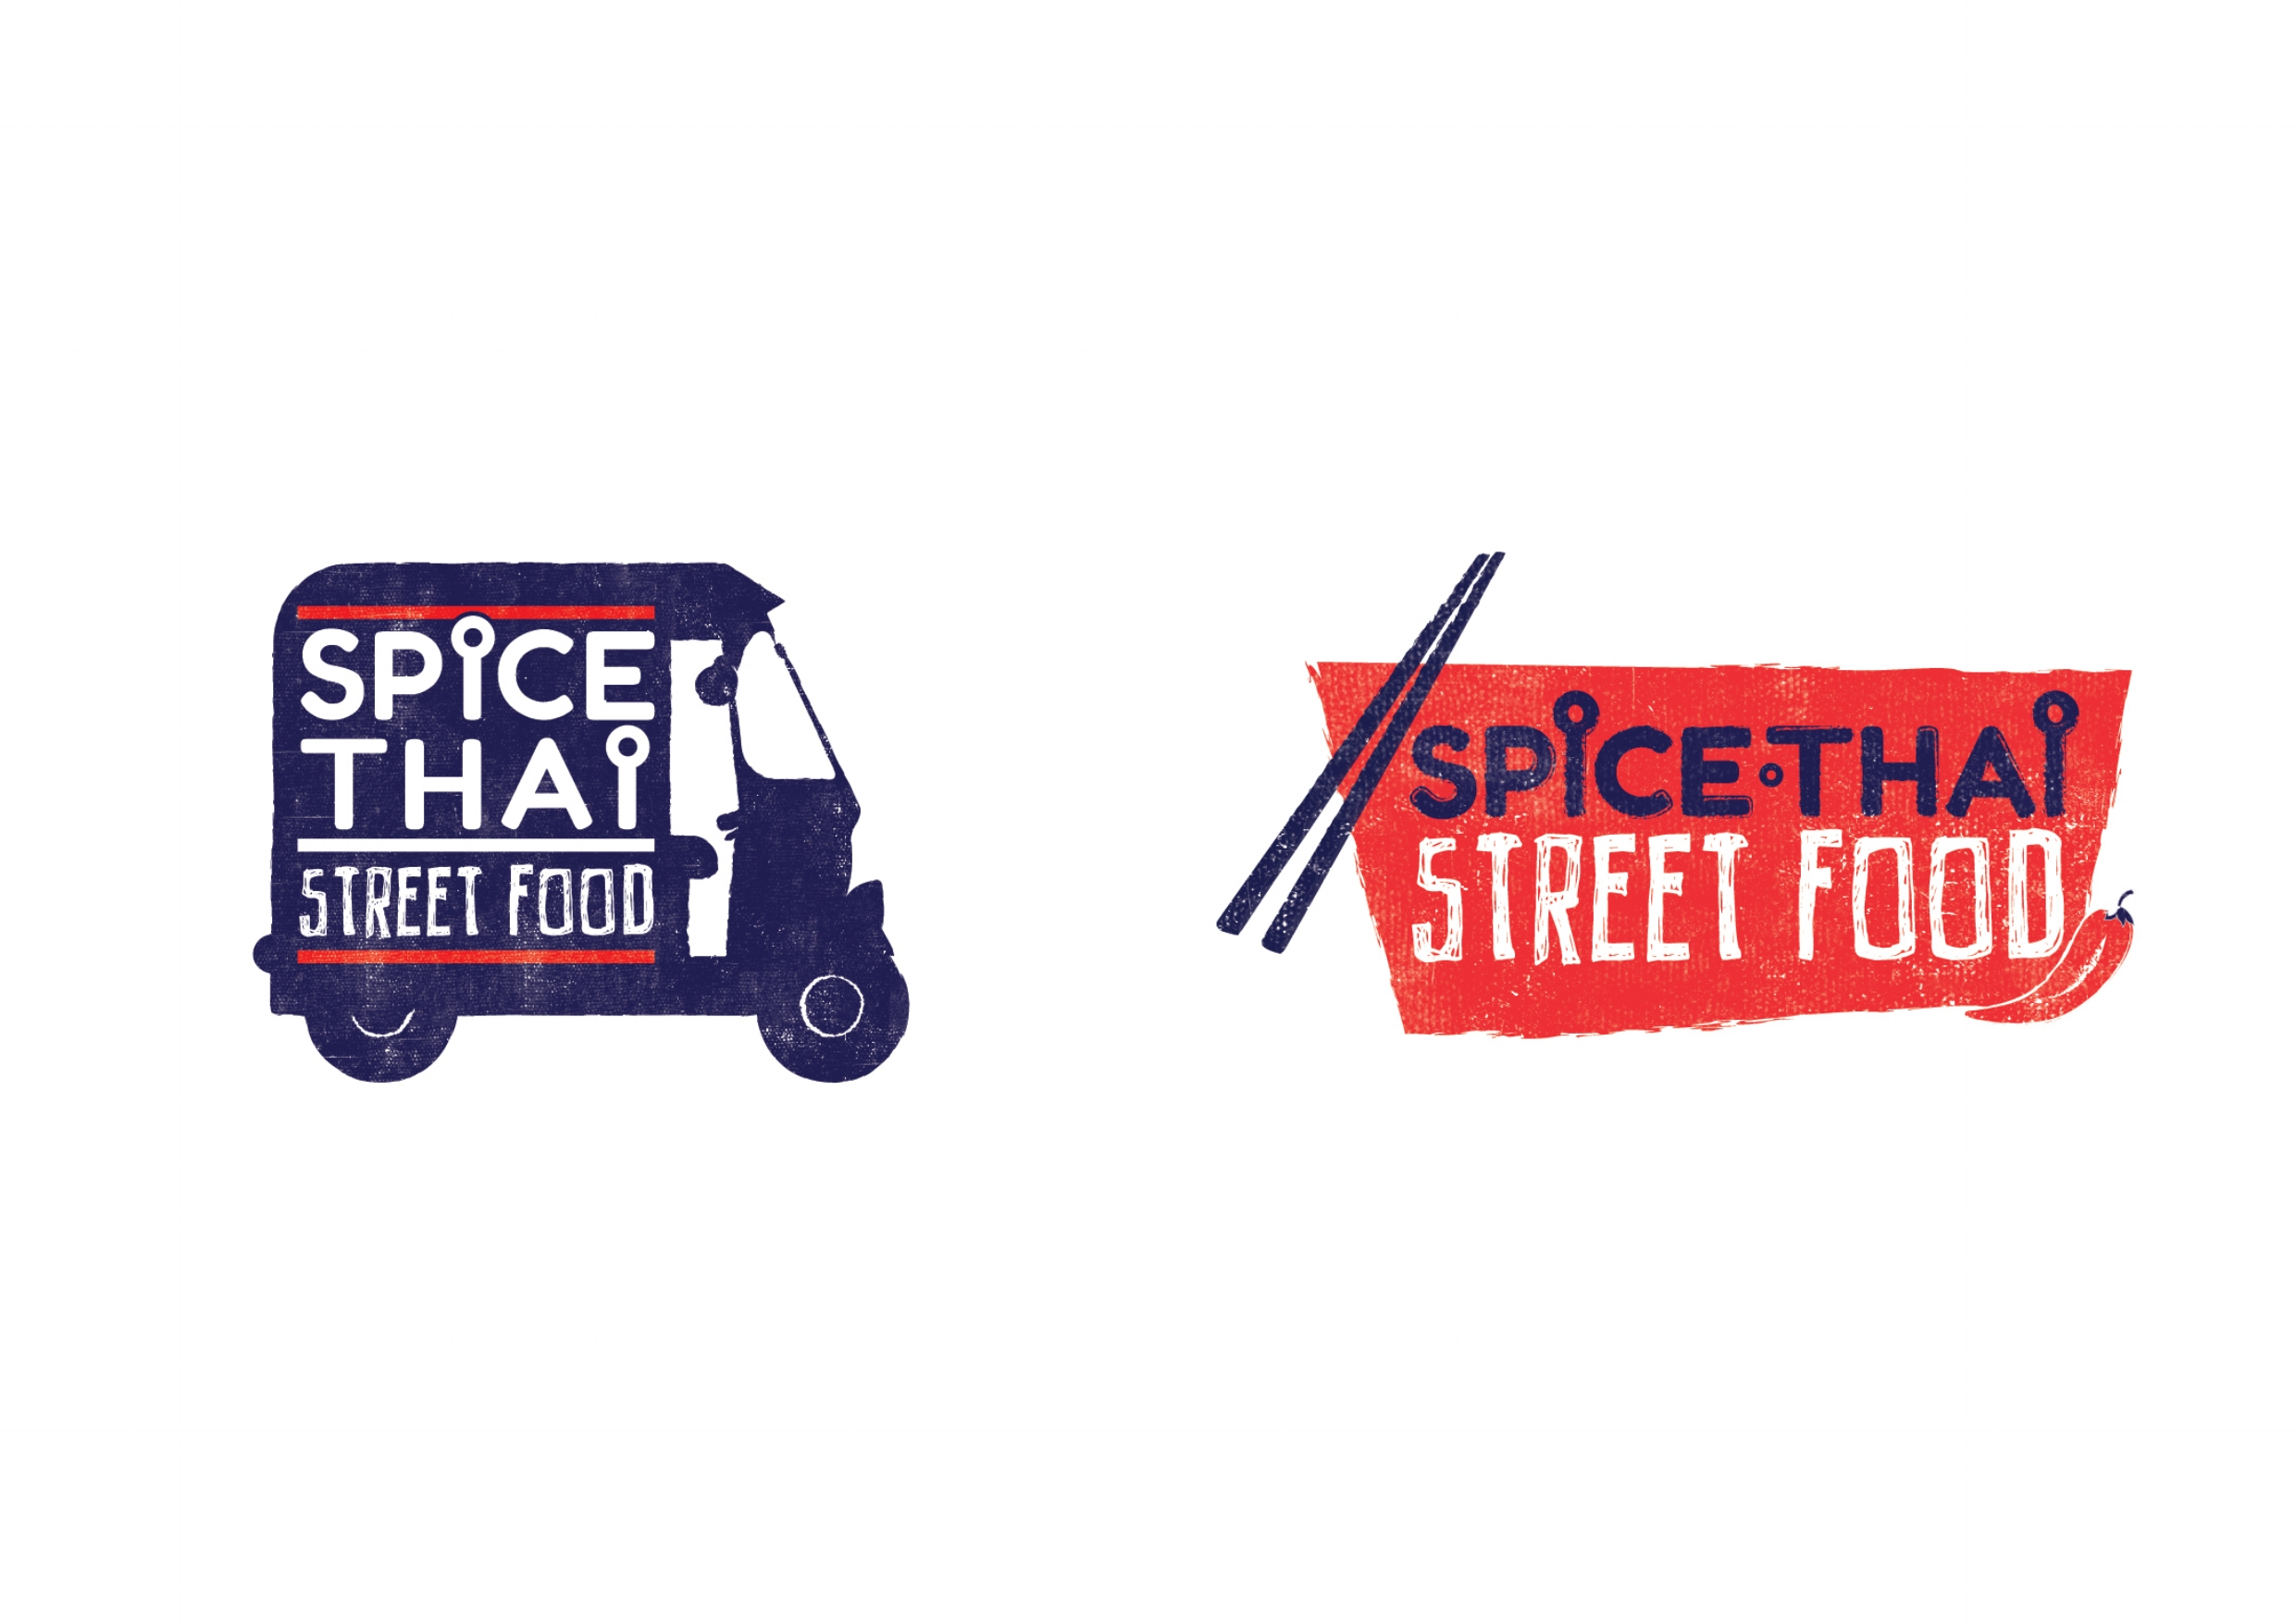 Spice_Thai_logo_ideas_v2-02.jpg